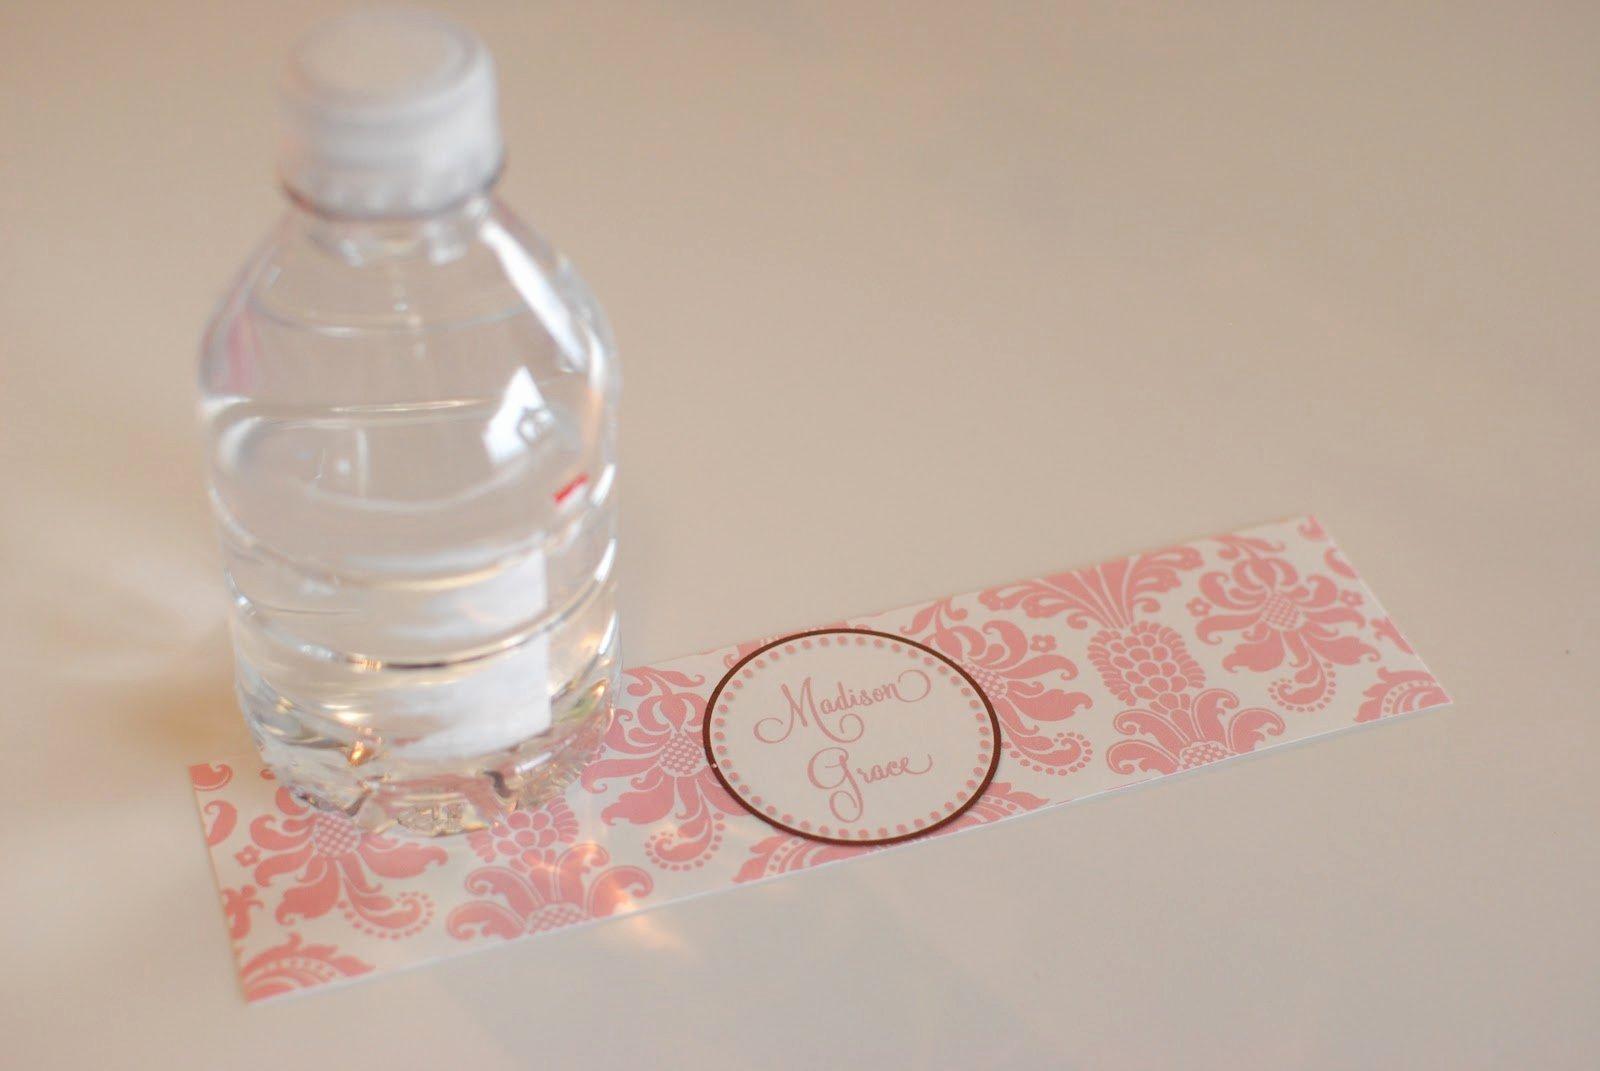 Free Water Bottle Label Template Fresh Water Bottle Labels Template